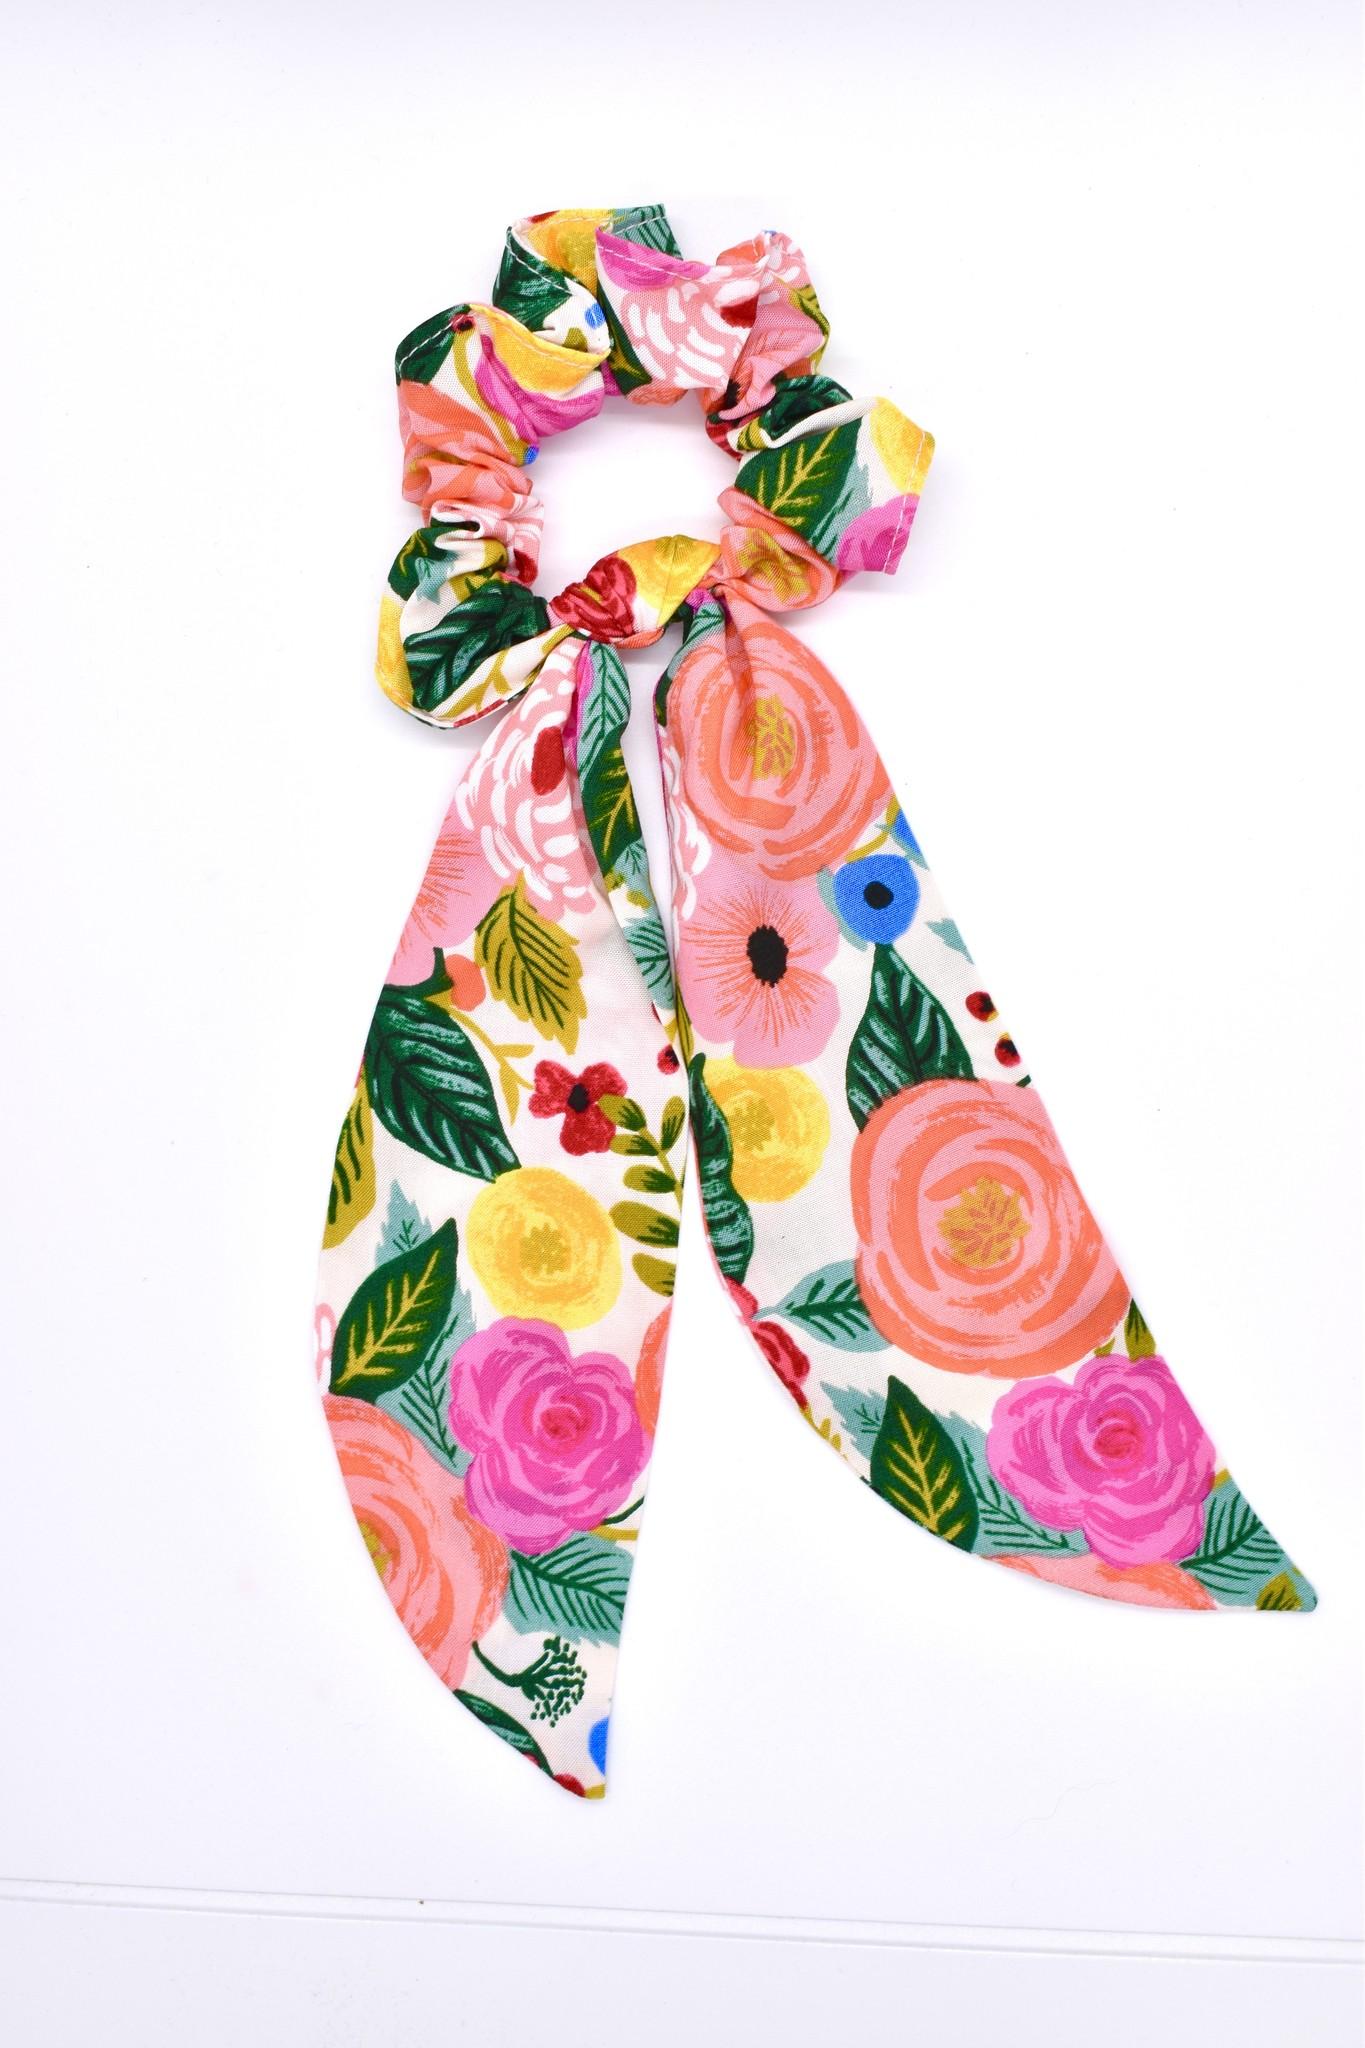 Felicity Howells - FH FH ACHA - Blush Juliet Rose Scrunchie